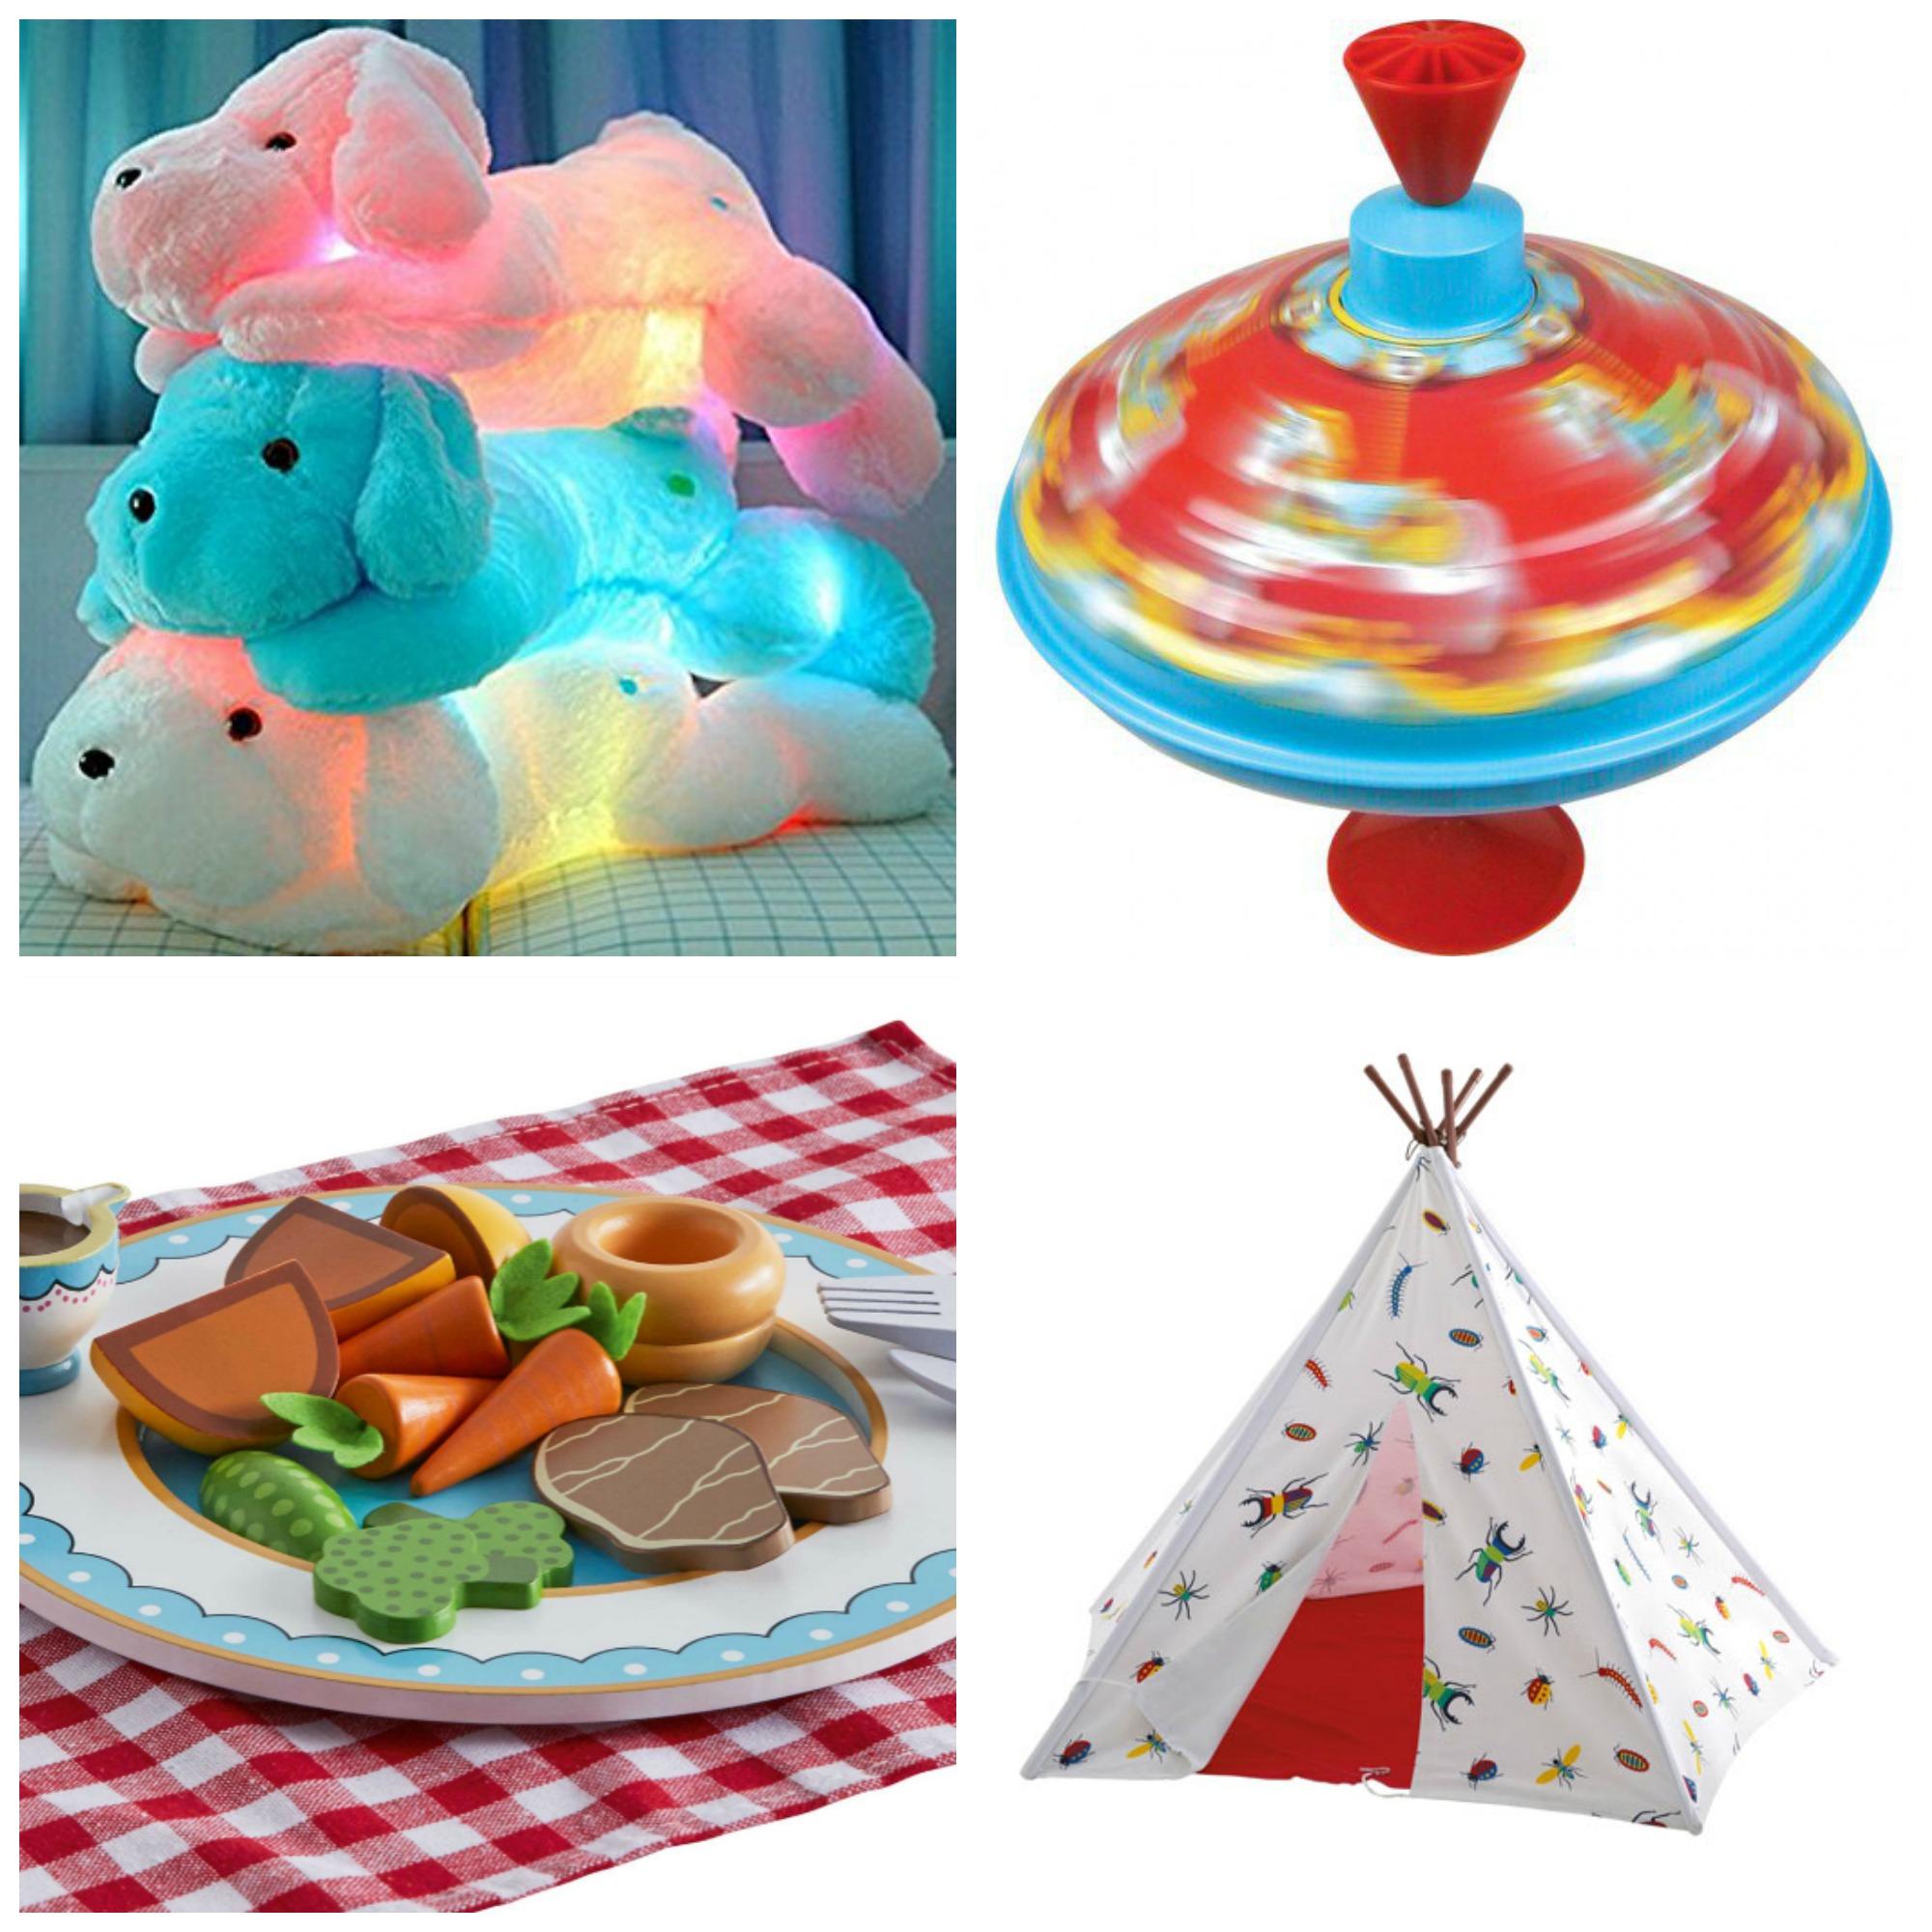 4 Christmas Ideas for Kids